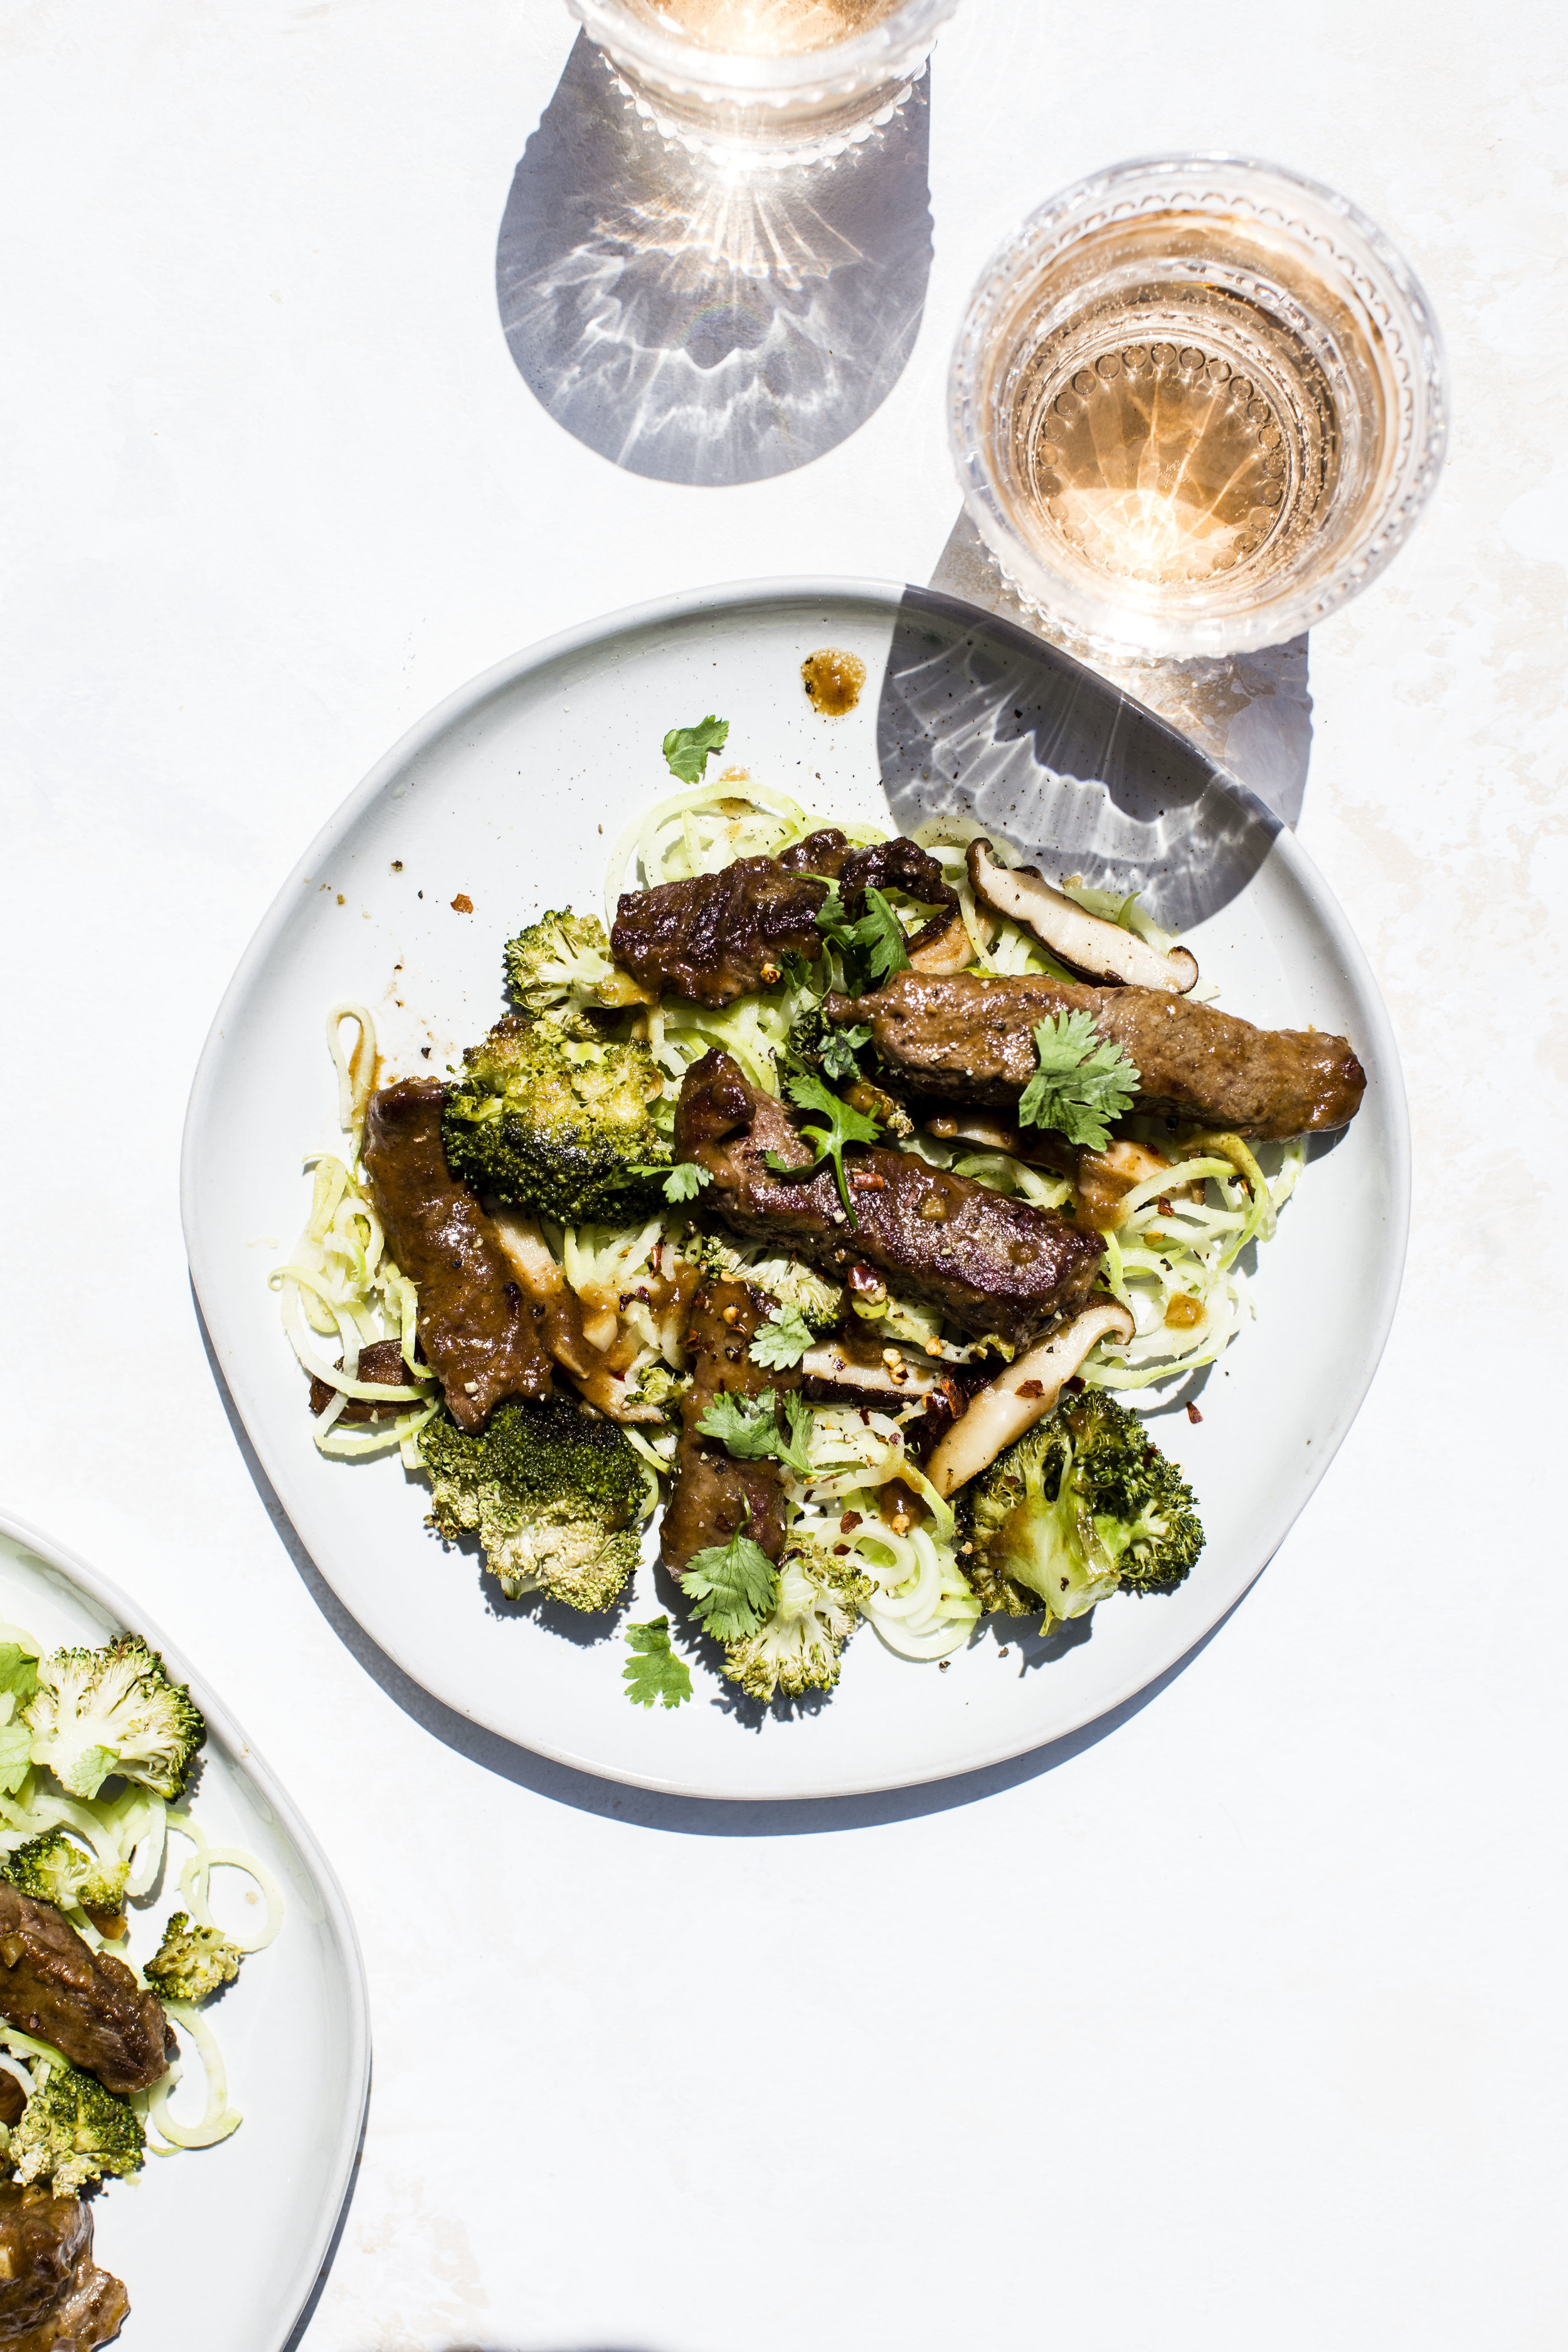 Paleo Beef Broccoli with Broccoli Stem Noodles 1 copy.jpg